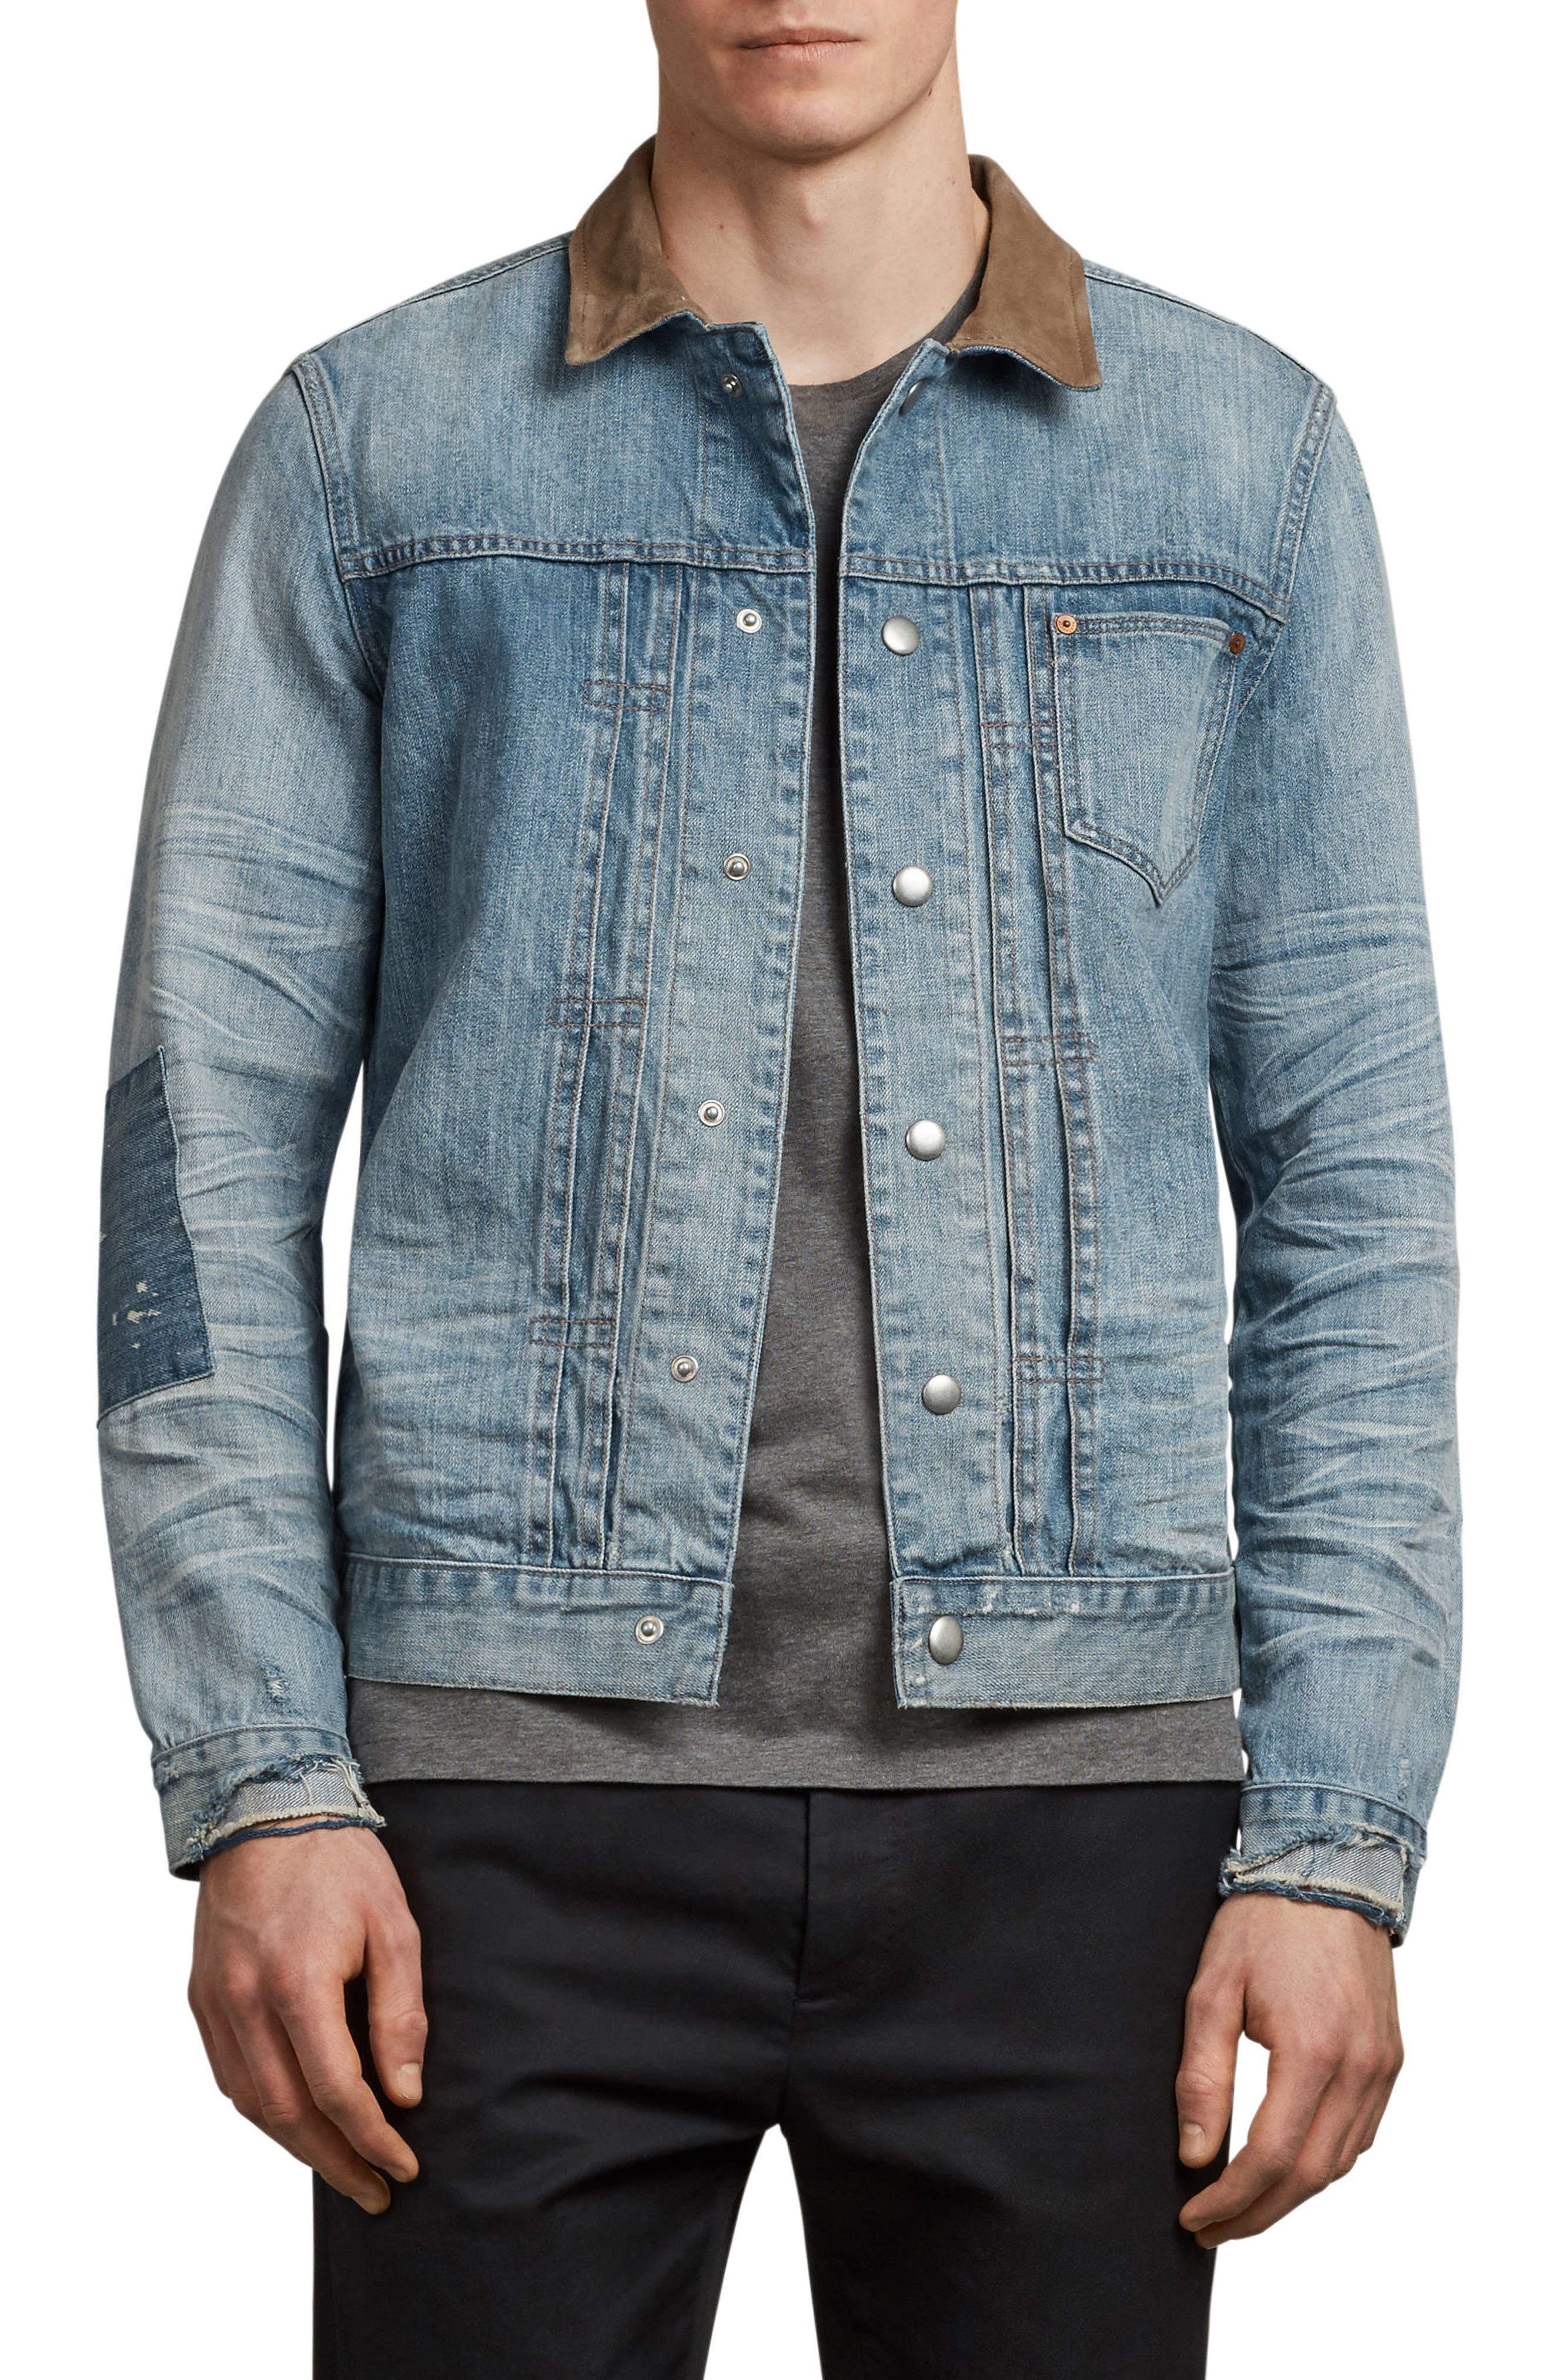 Ibanex Slim Fit Distressed Denim Jacket,                             Main thumbnail 1, color,                             Indigo